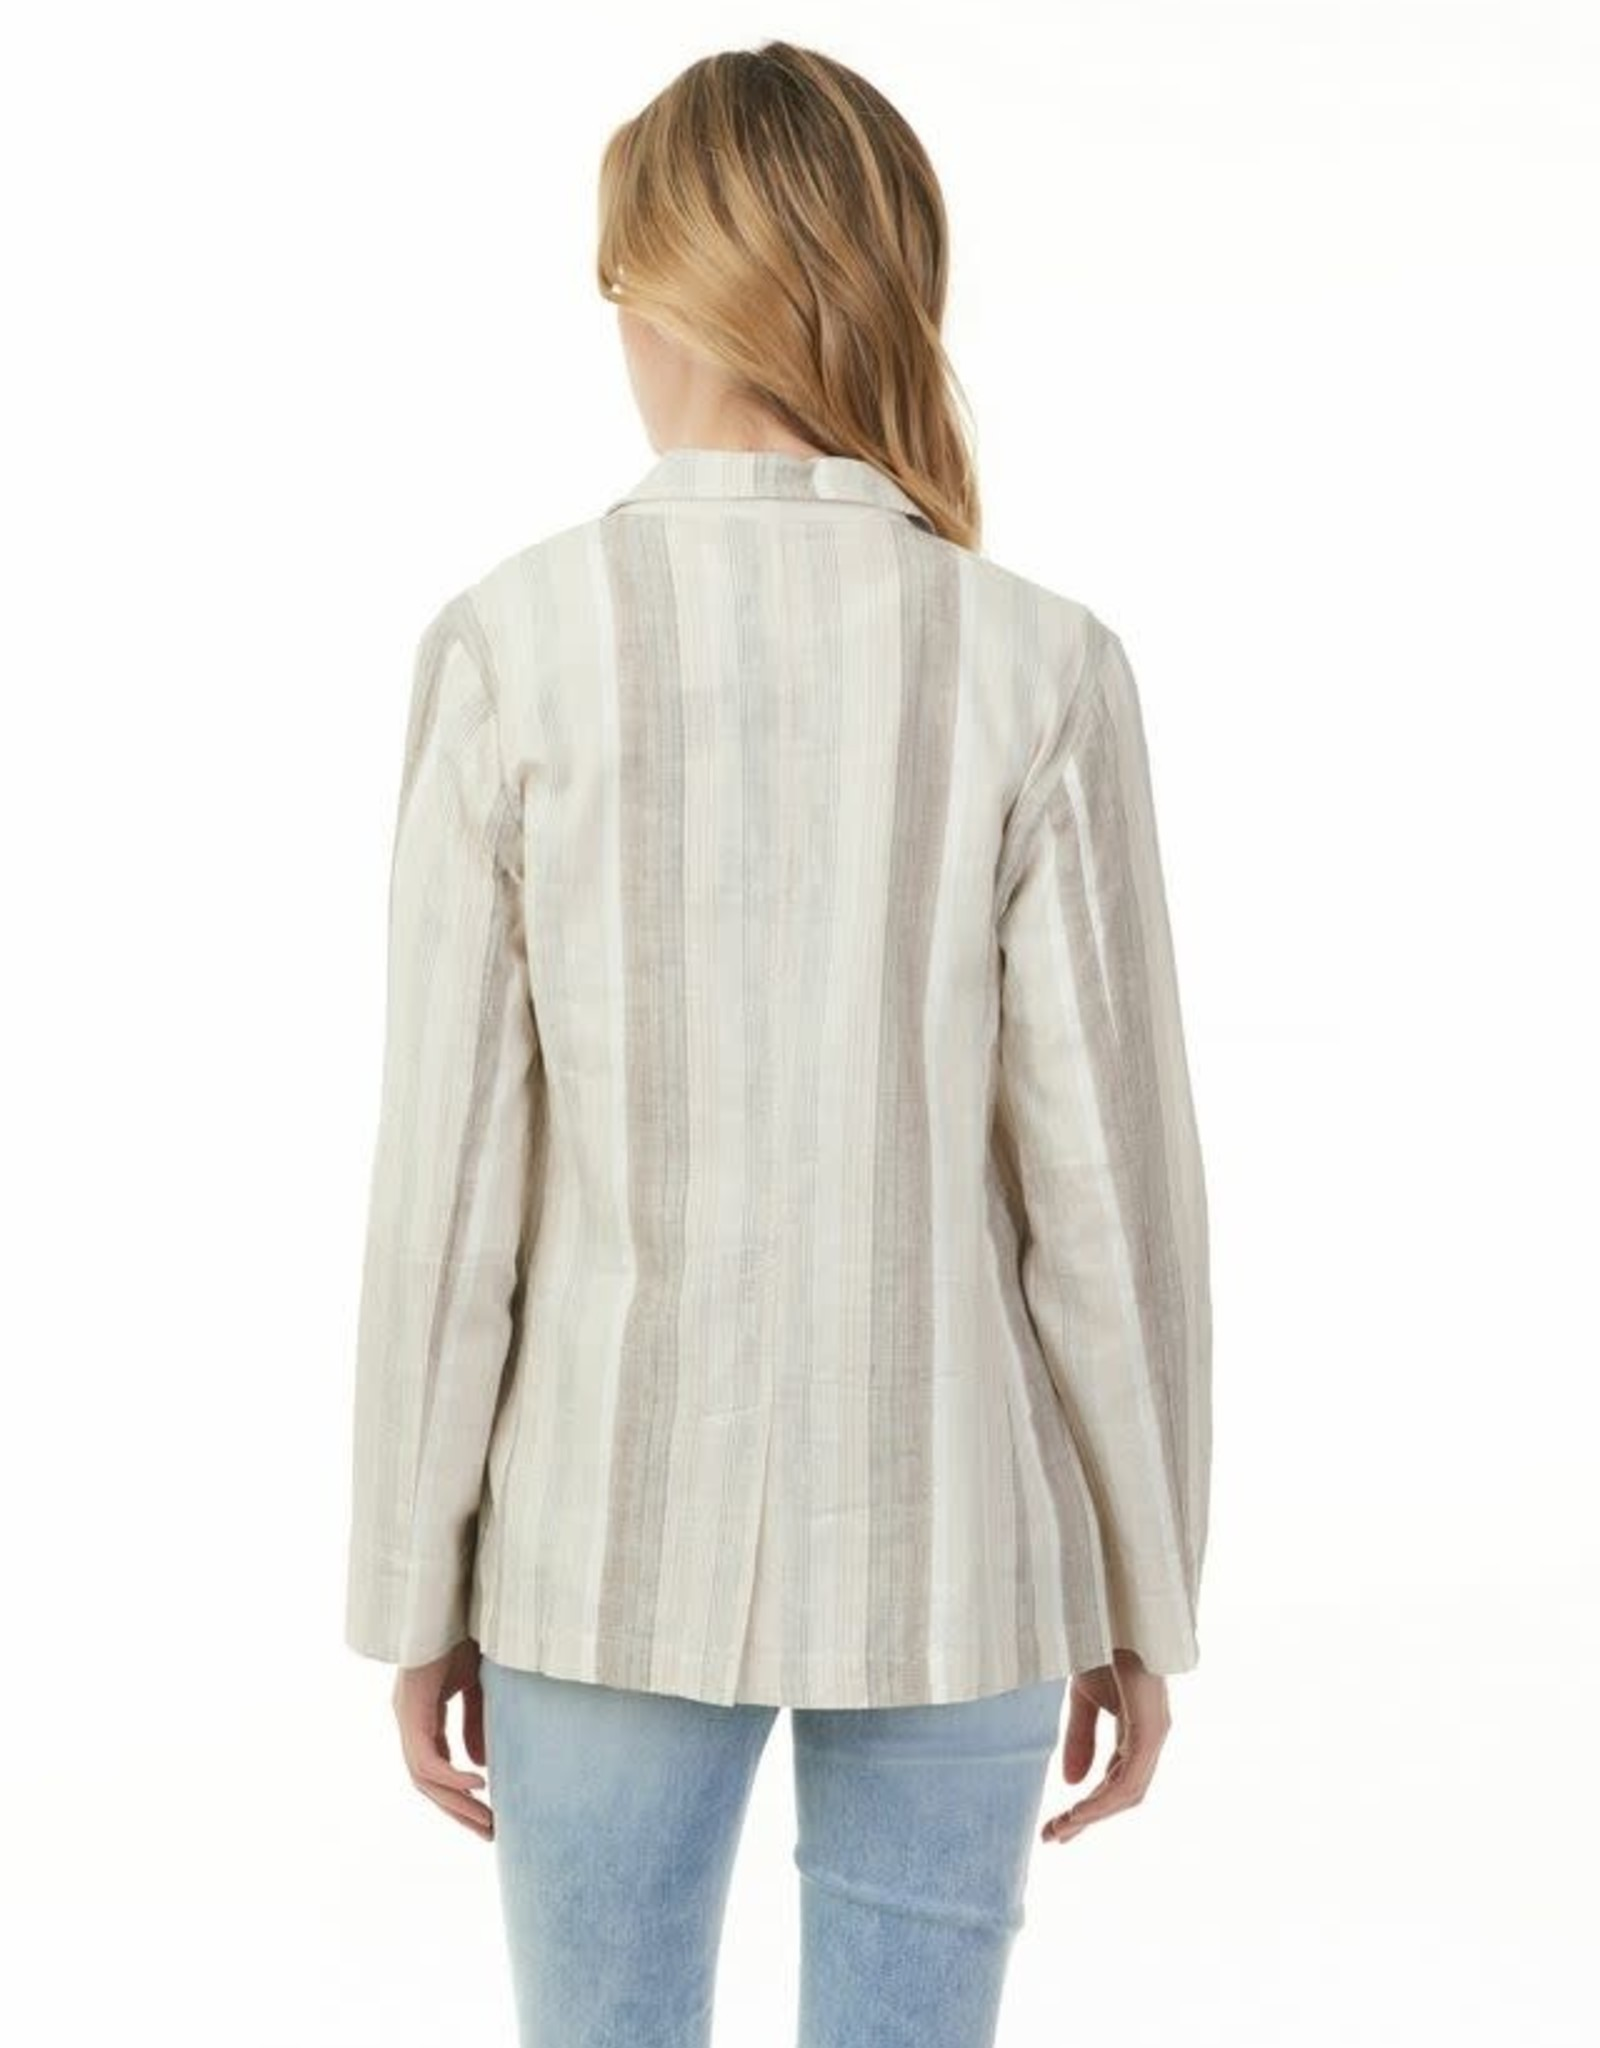 - Desertic Stripe Blazer Style Jacket